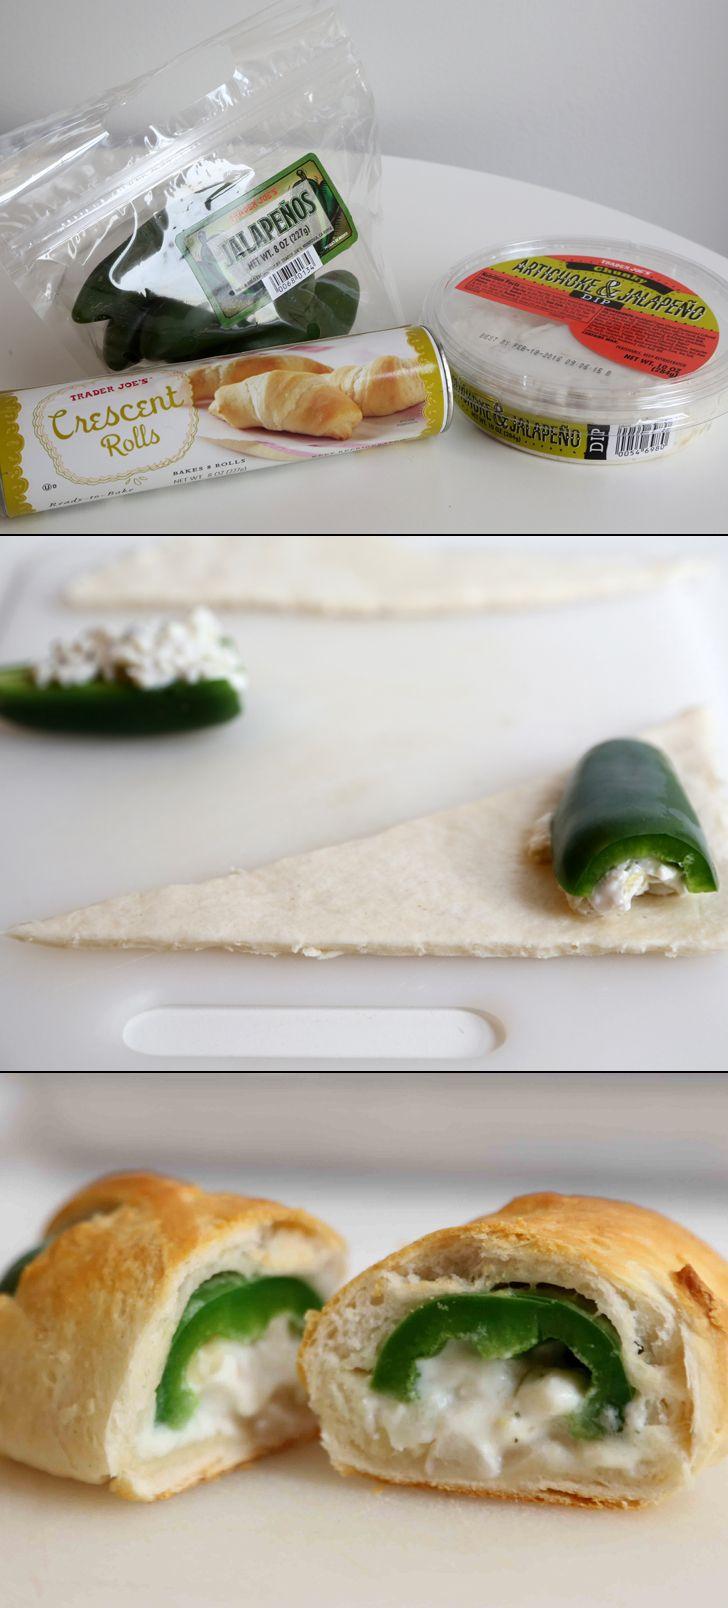 A Trader Joe's appetizer hack you've GOT to try: Jalapeño popper crescent rolls.